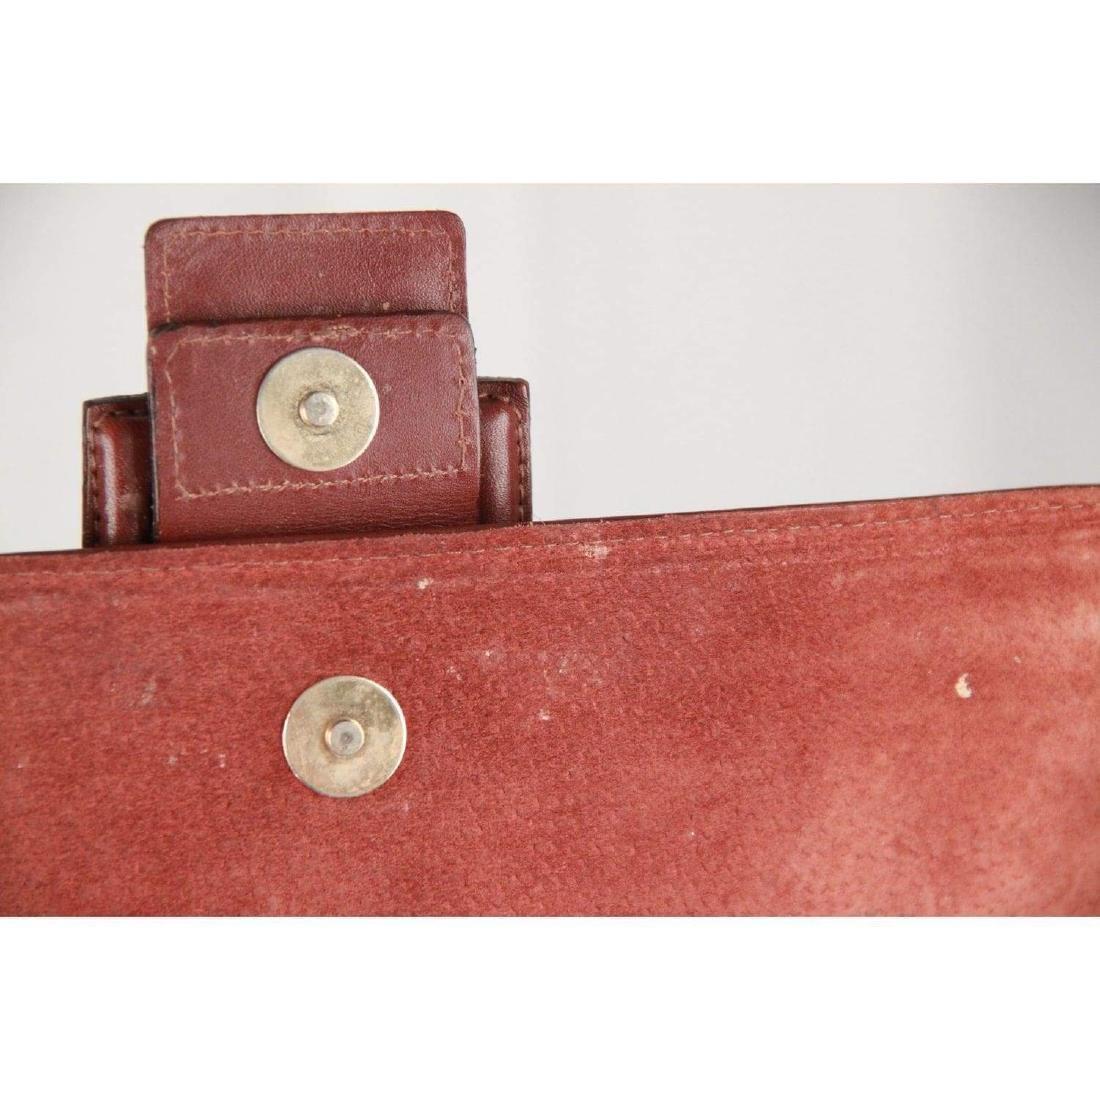 MONTENAPOLEONE Vintage Brown Leather HANDBAG - 10